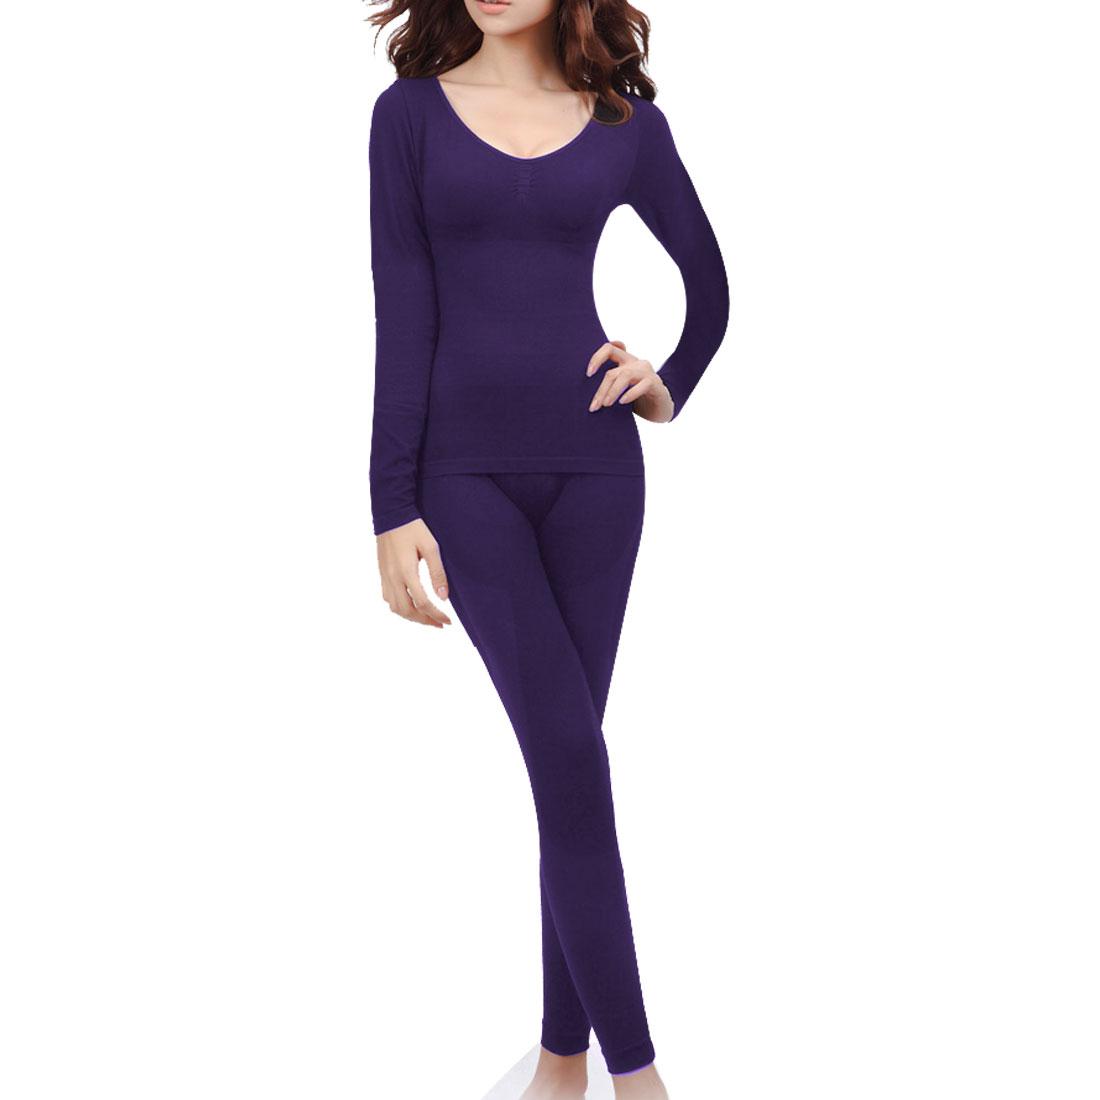 Women Lozenge Print Thin Seamless Thermal Underwear Set Dark Purple XS